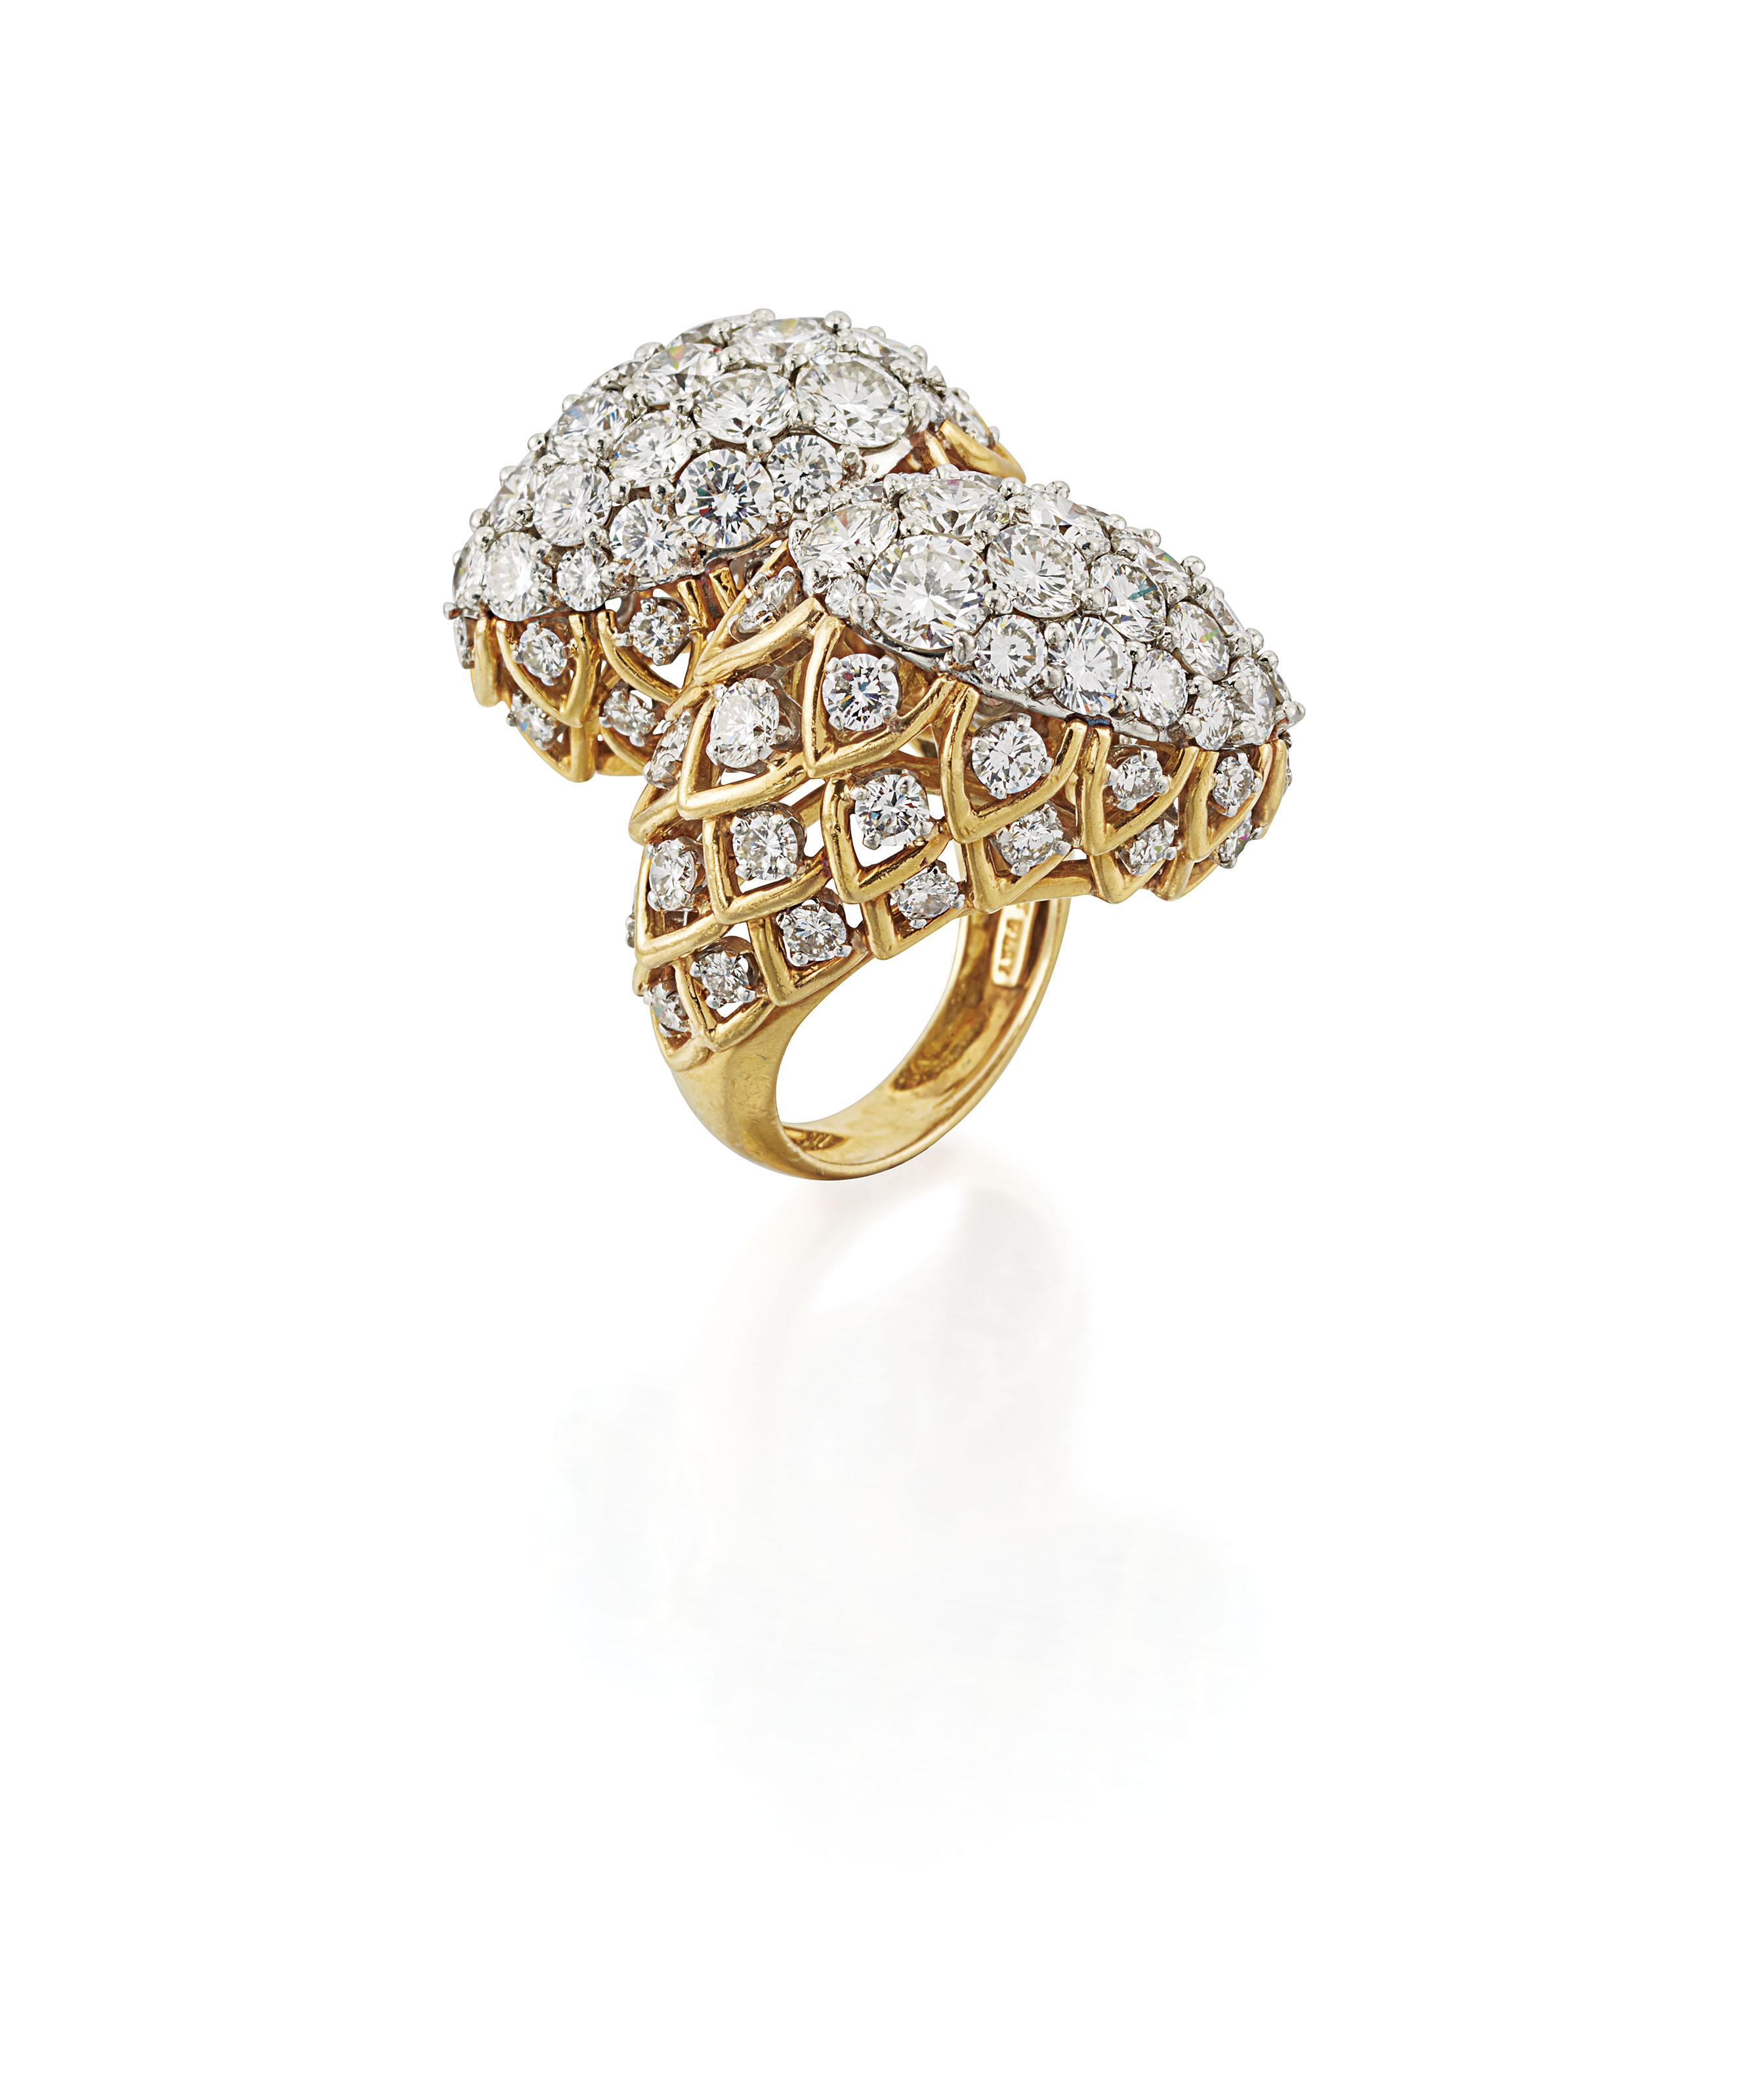 DIAMOND COCKTAIL RING, DAVID W